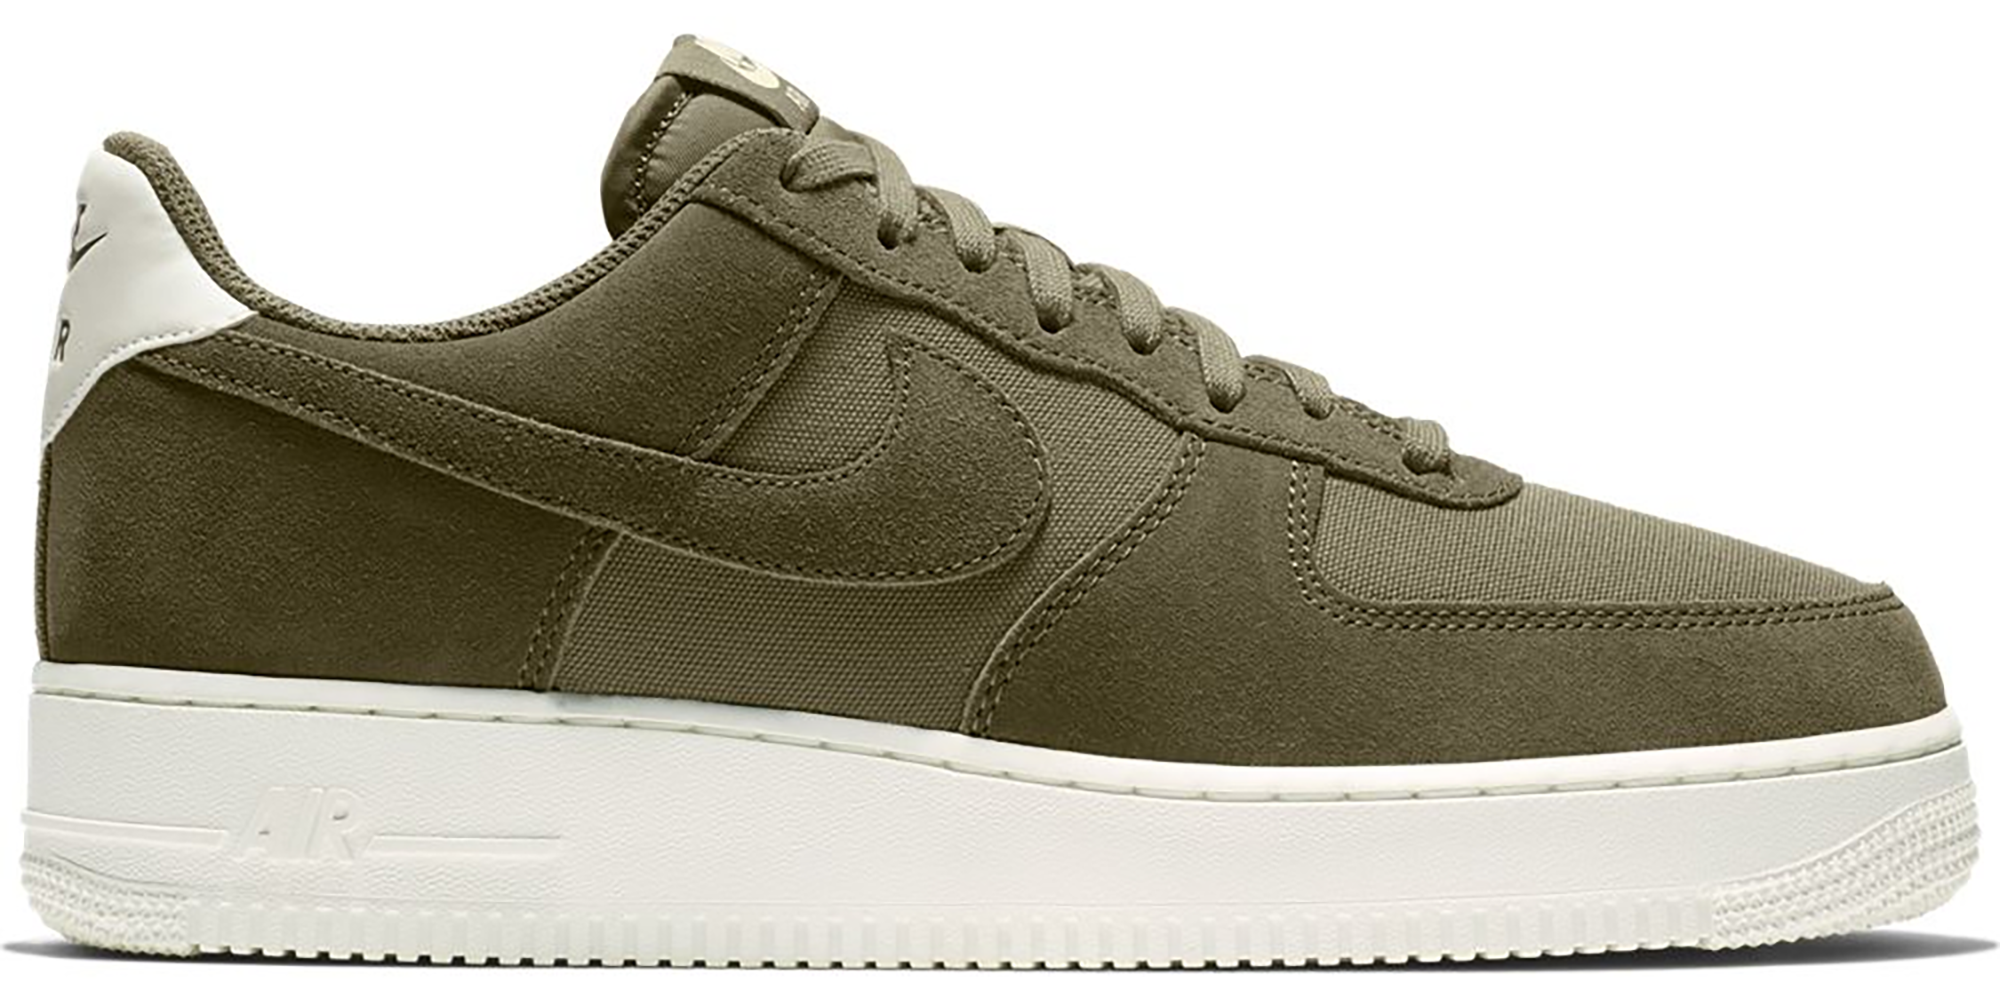 Nike Air Force 1 Low Suede Medium Olive